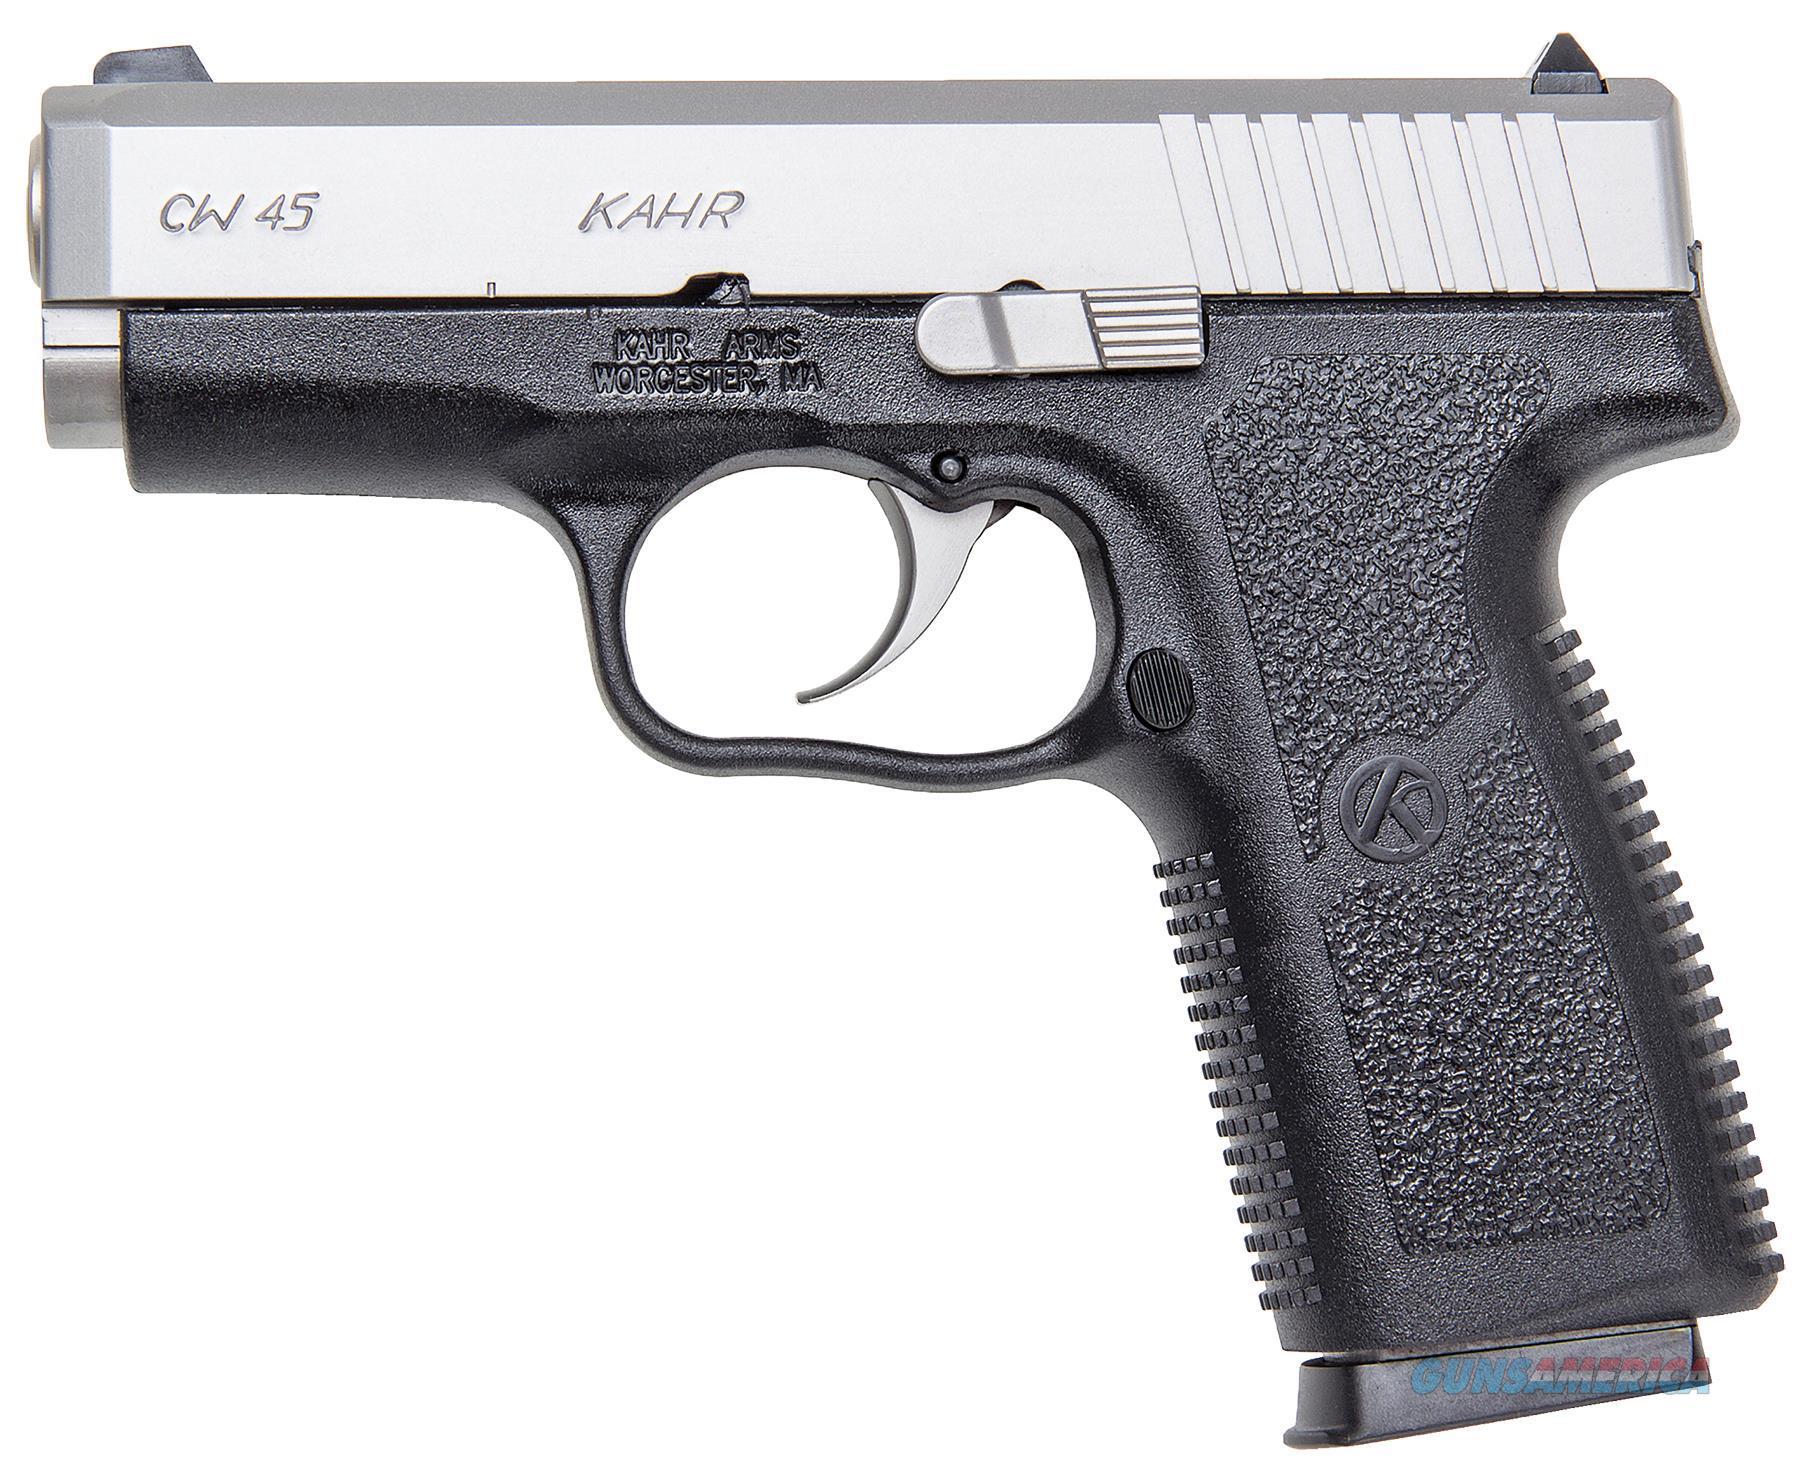 "Kahr Arms Cw4543 Cw45 Standard Dao 45Acp 3.6"" 7+1 Black Poly Grip Blk Poly Frame CW4543  Guns > Pistols > K Misc Pistols"